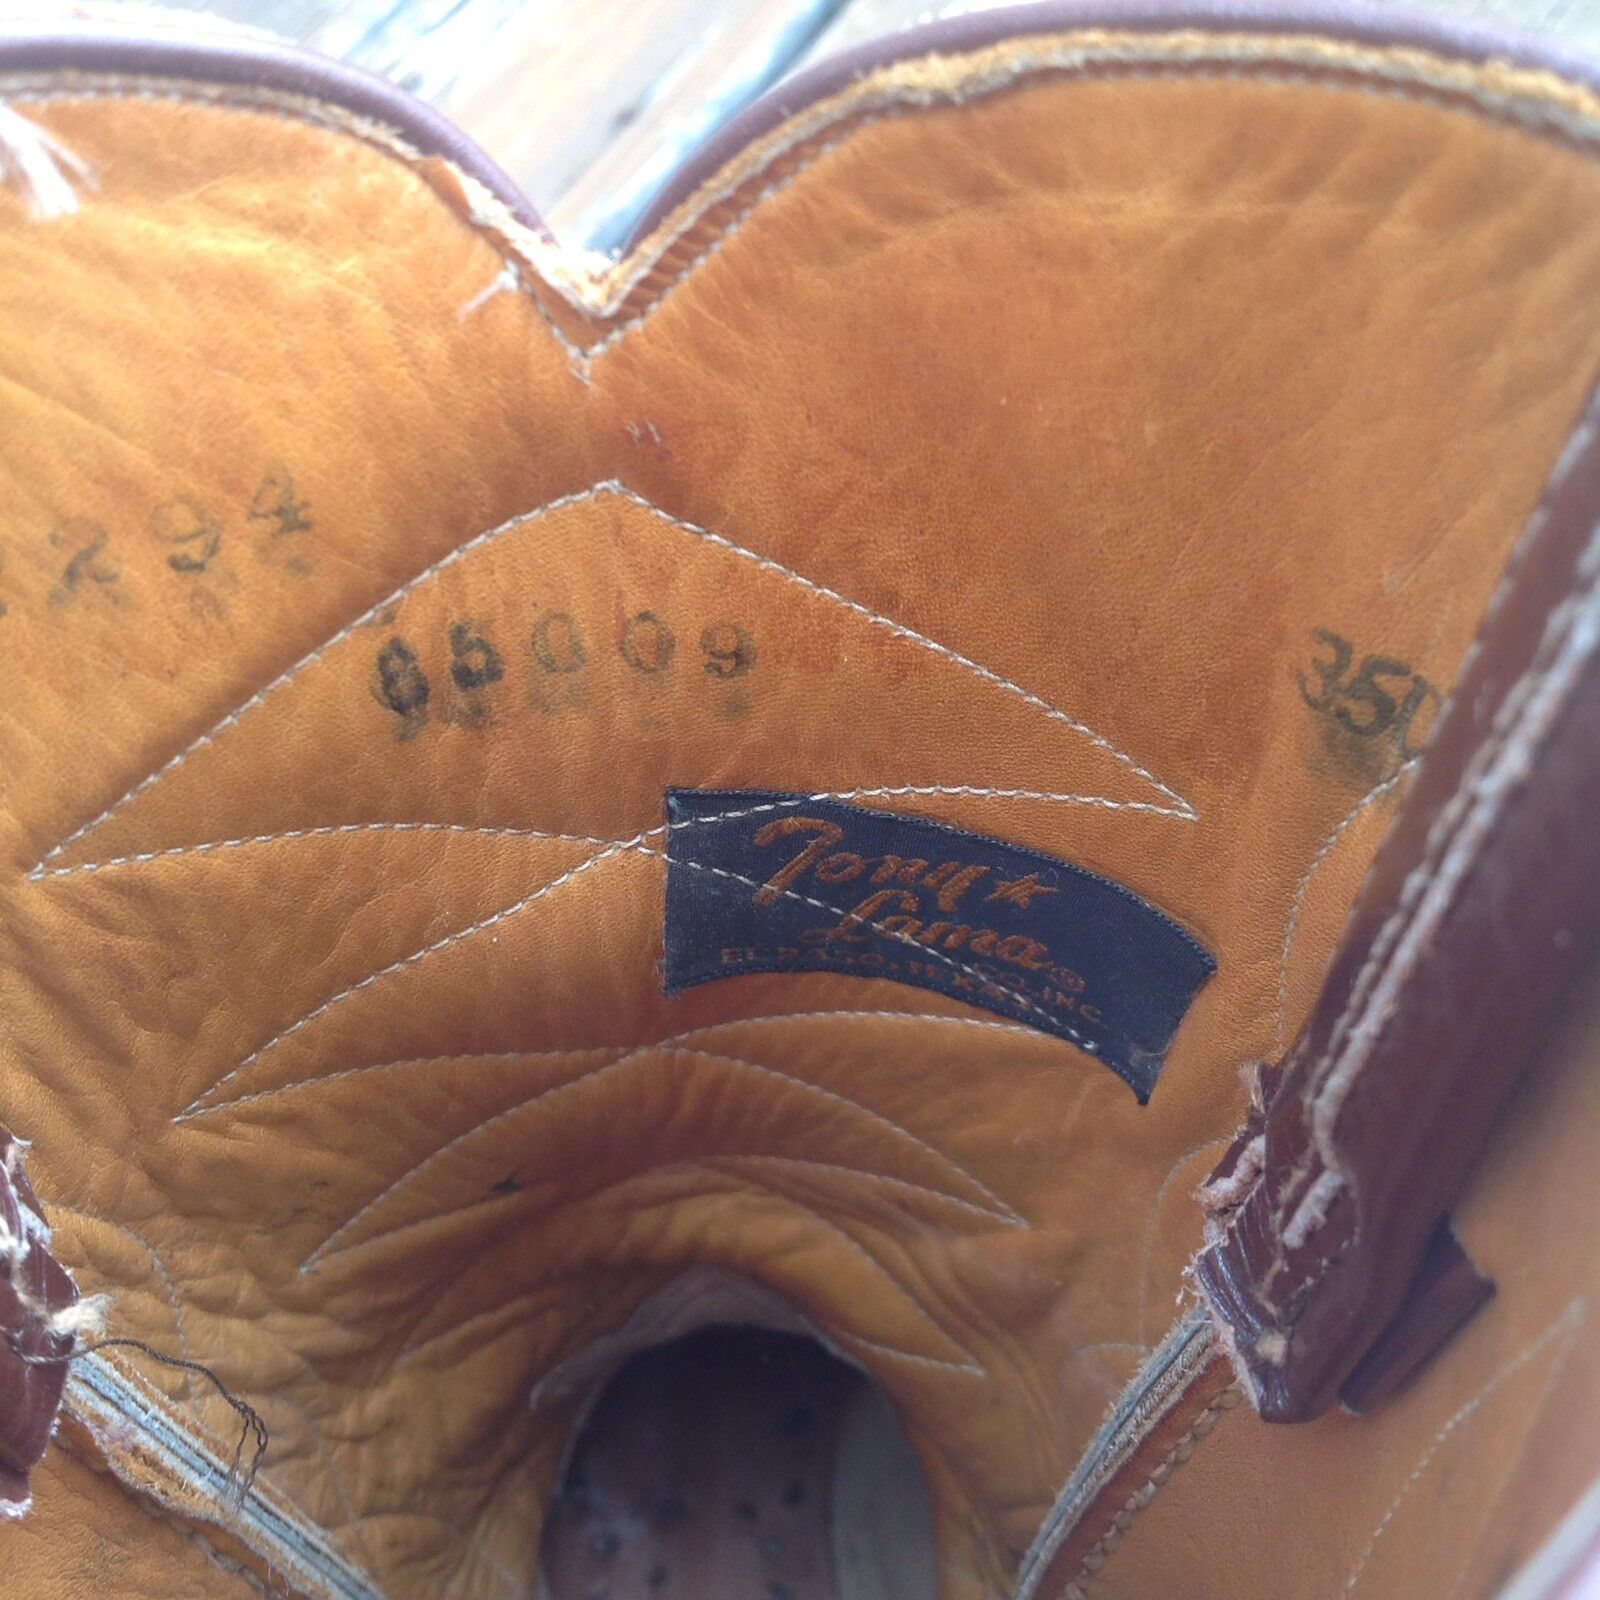 "Tony Lama Braun Cowboy Western Stiefel Leder Damenschuhe 10"" Heel To Toe Damenschuhe Leder Schuhes 84529e"